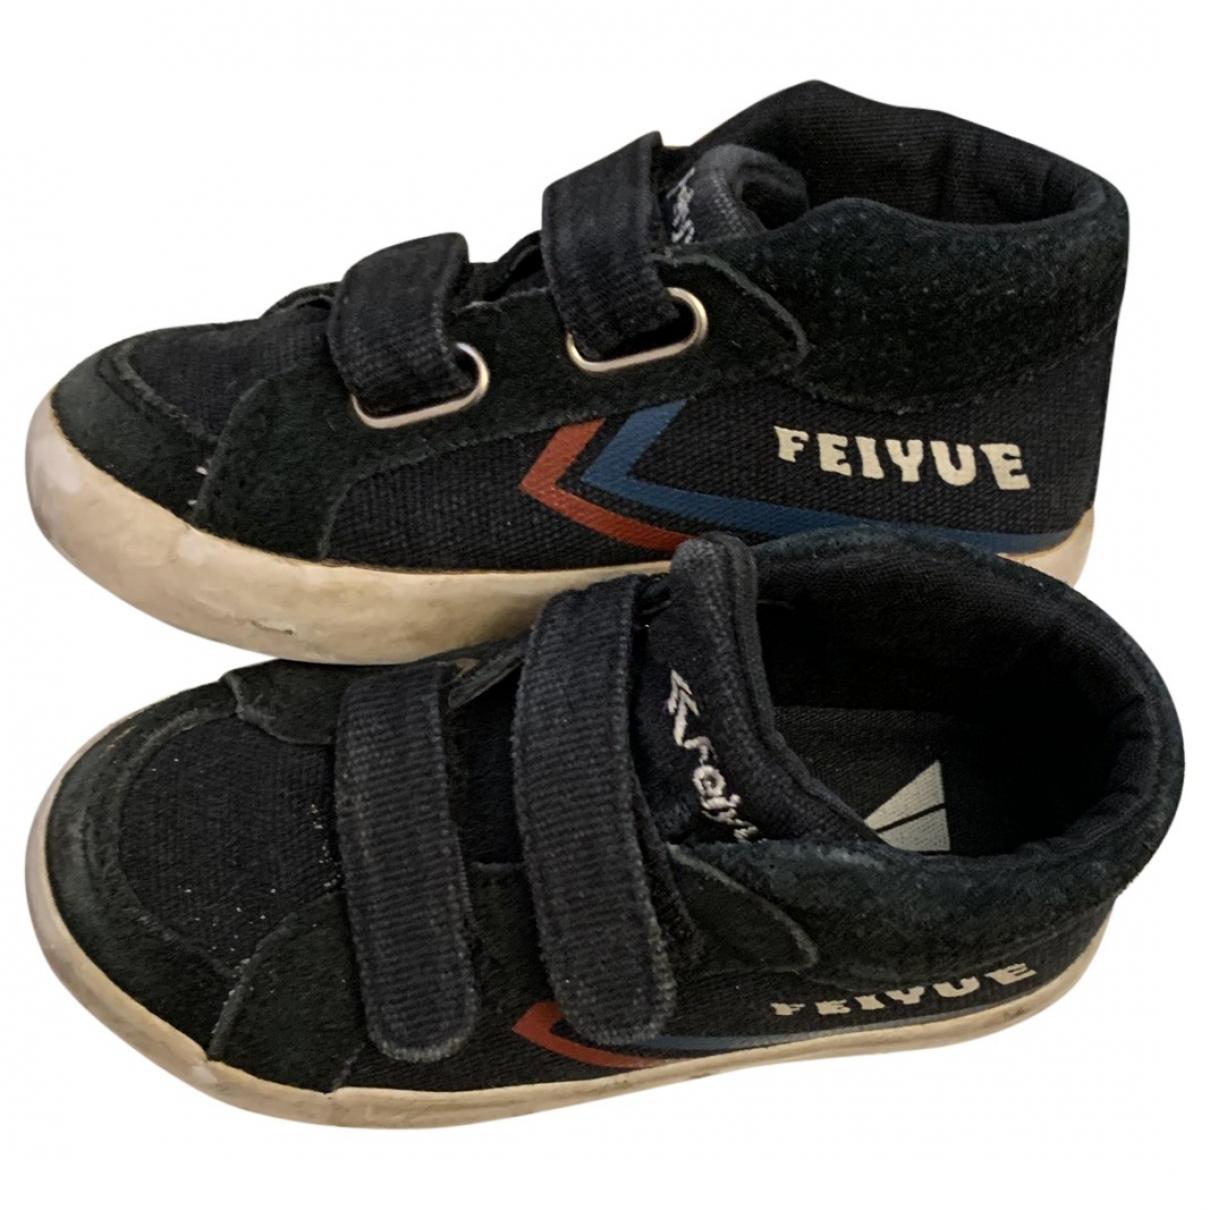 Feiyue \N Sneakers in  Schwarz Leinen